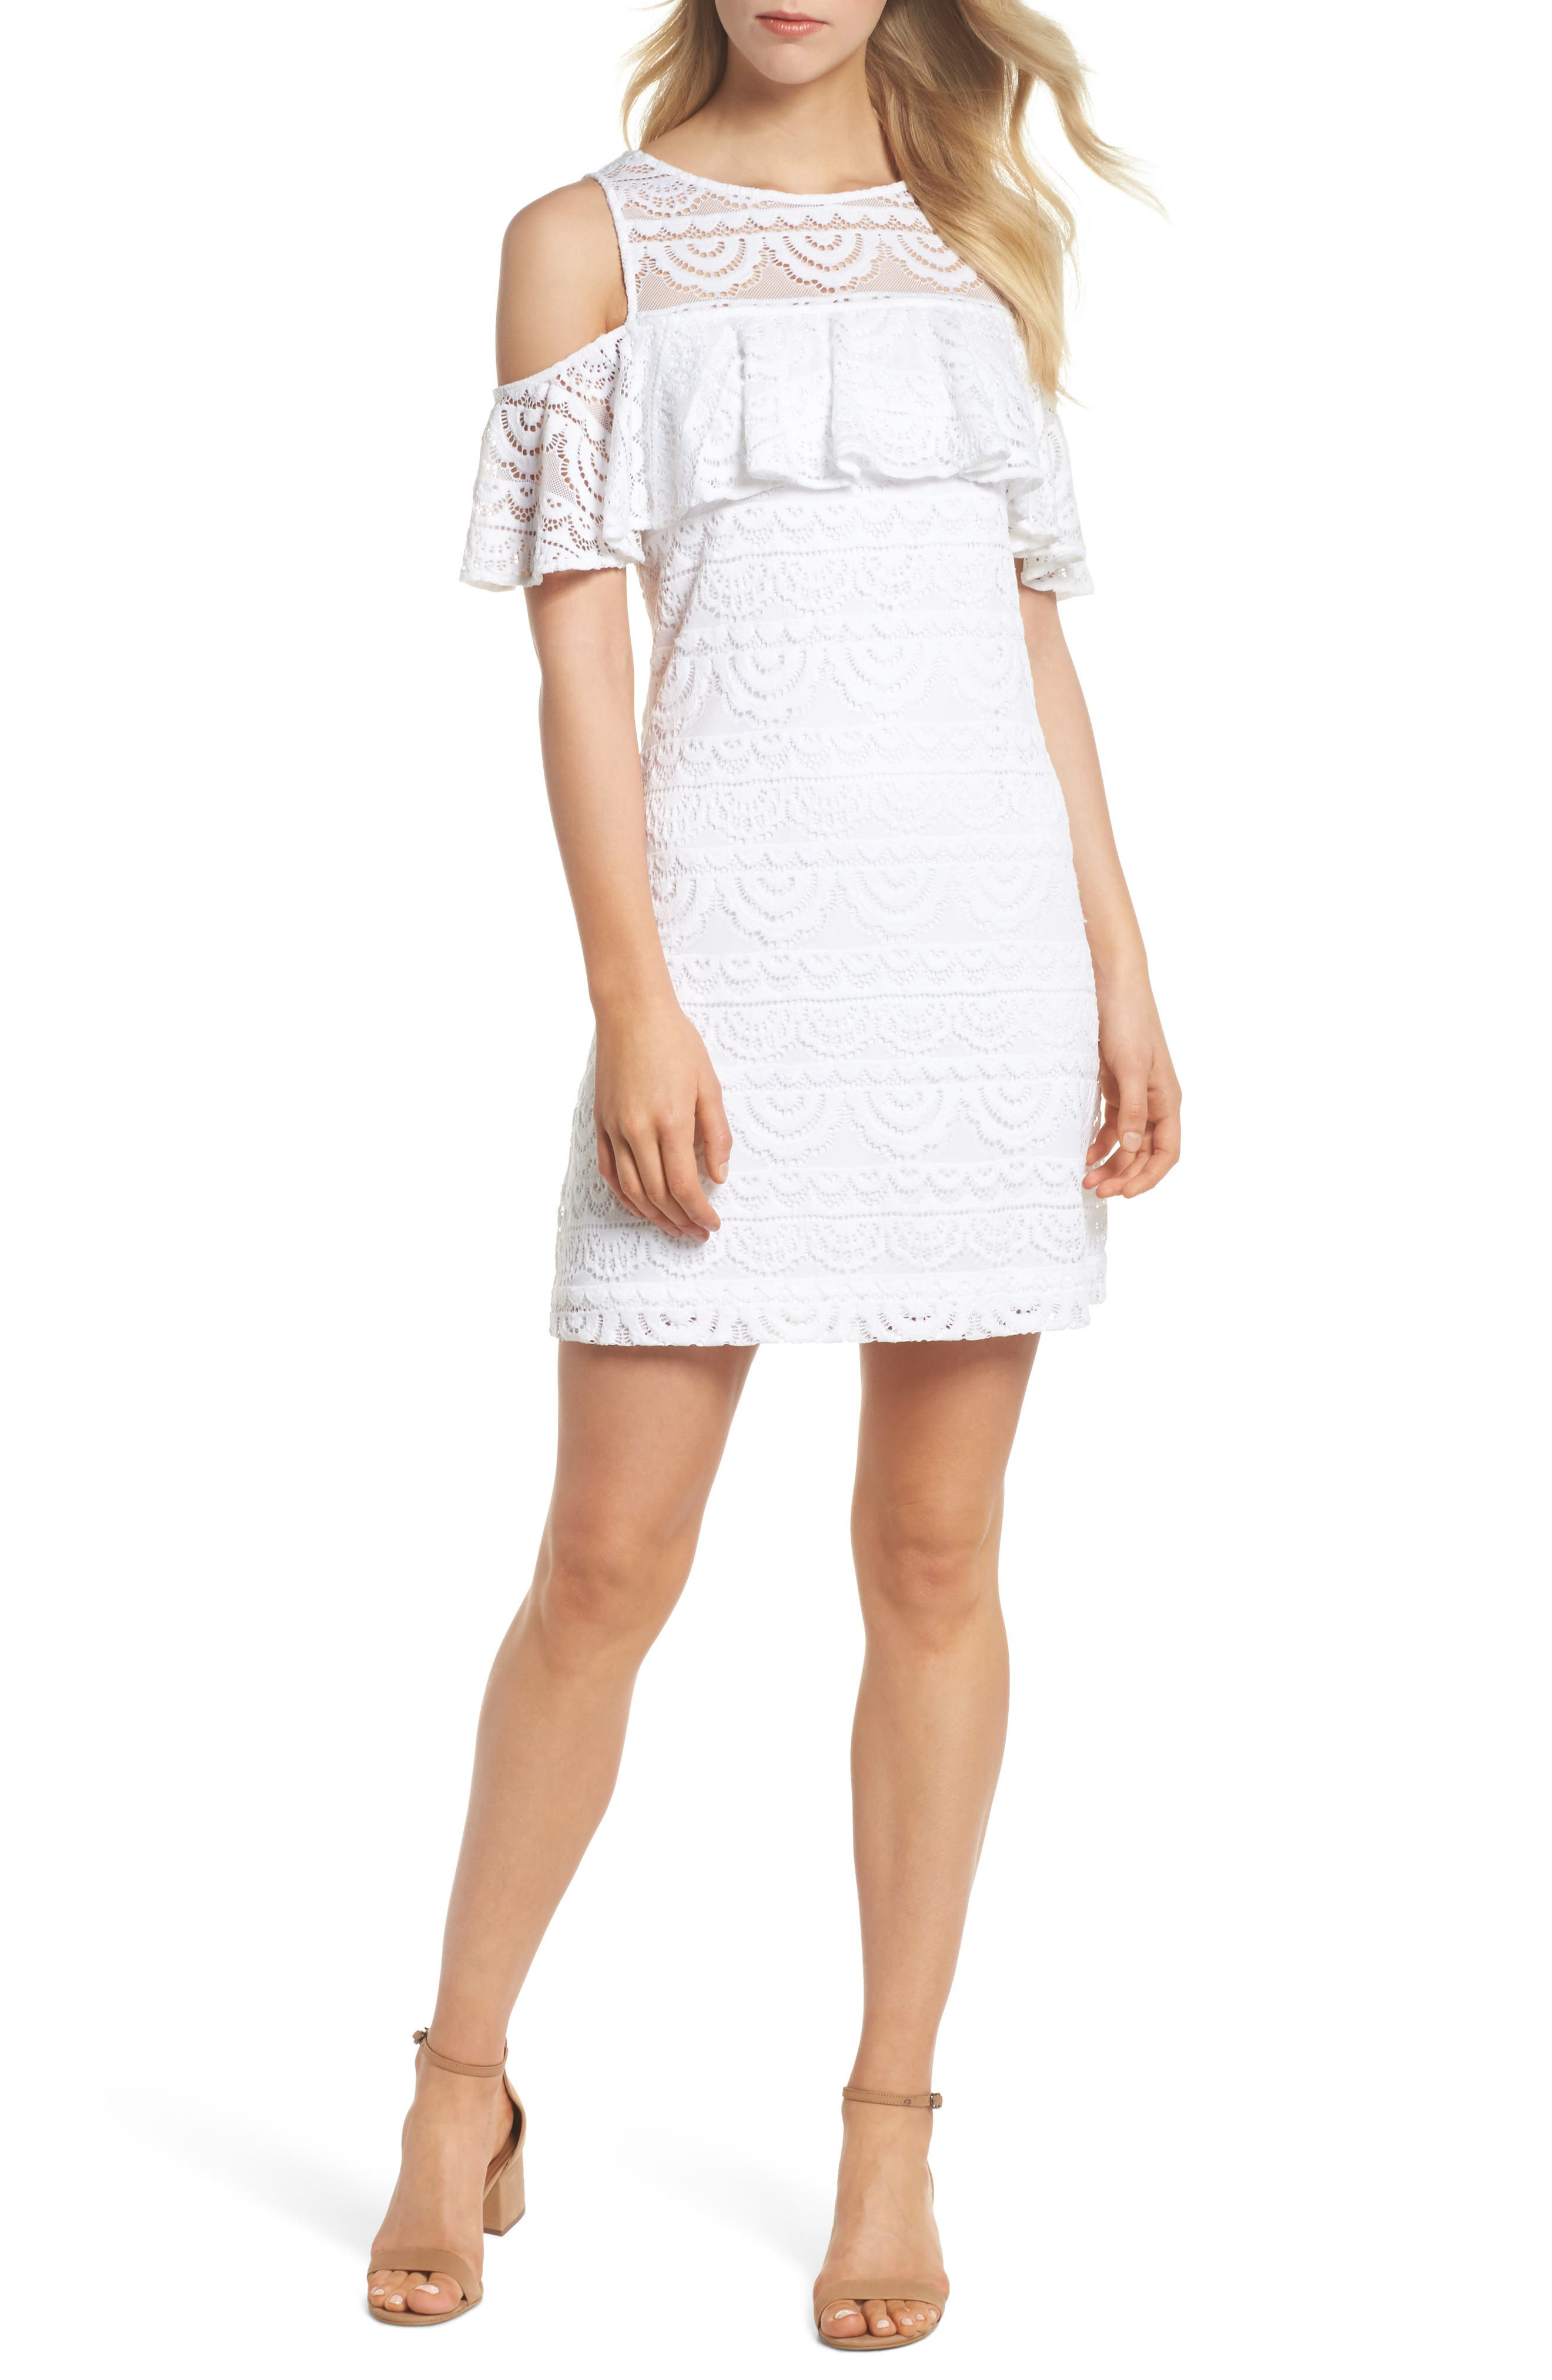 Lyra Cold Shoulder Lace Dress,                             Main thumbnail 1, color,                             Resort White Scallop Lace